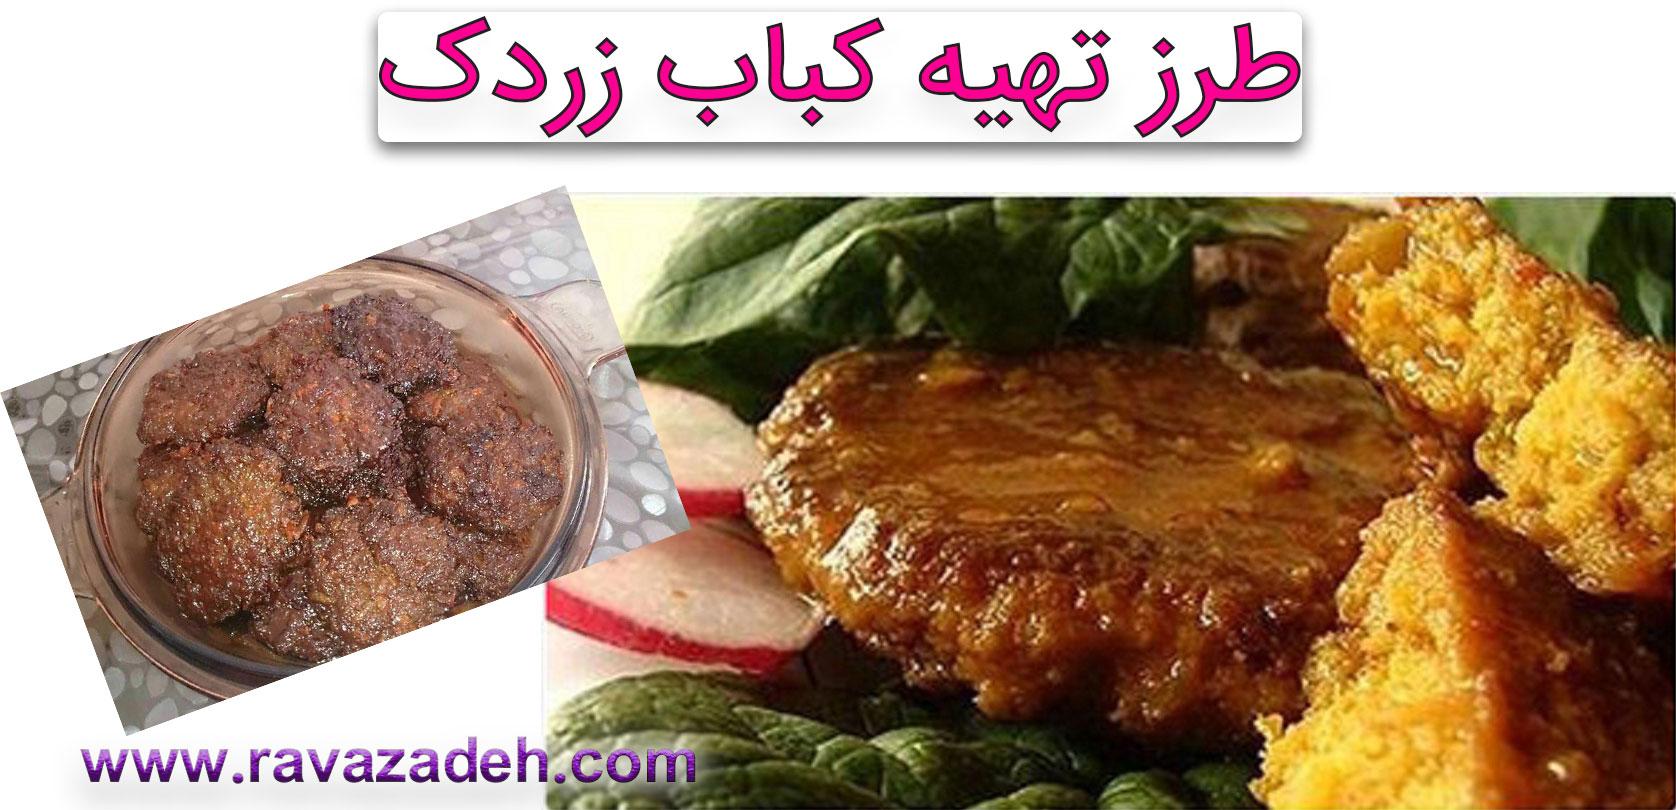 Photo of طرز تهیه کباب زردک اصفهانی